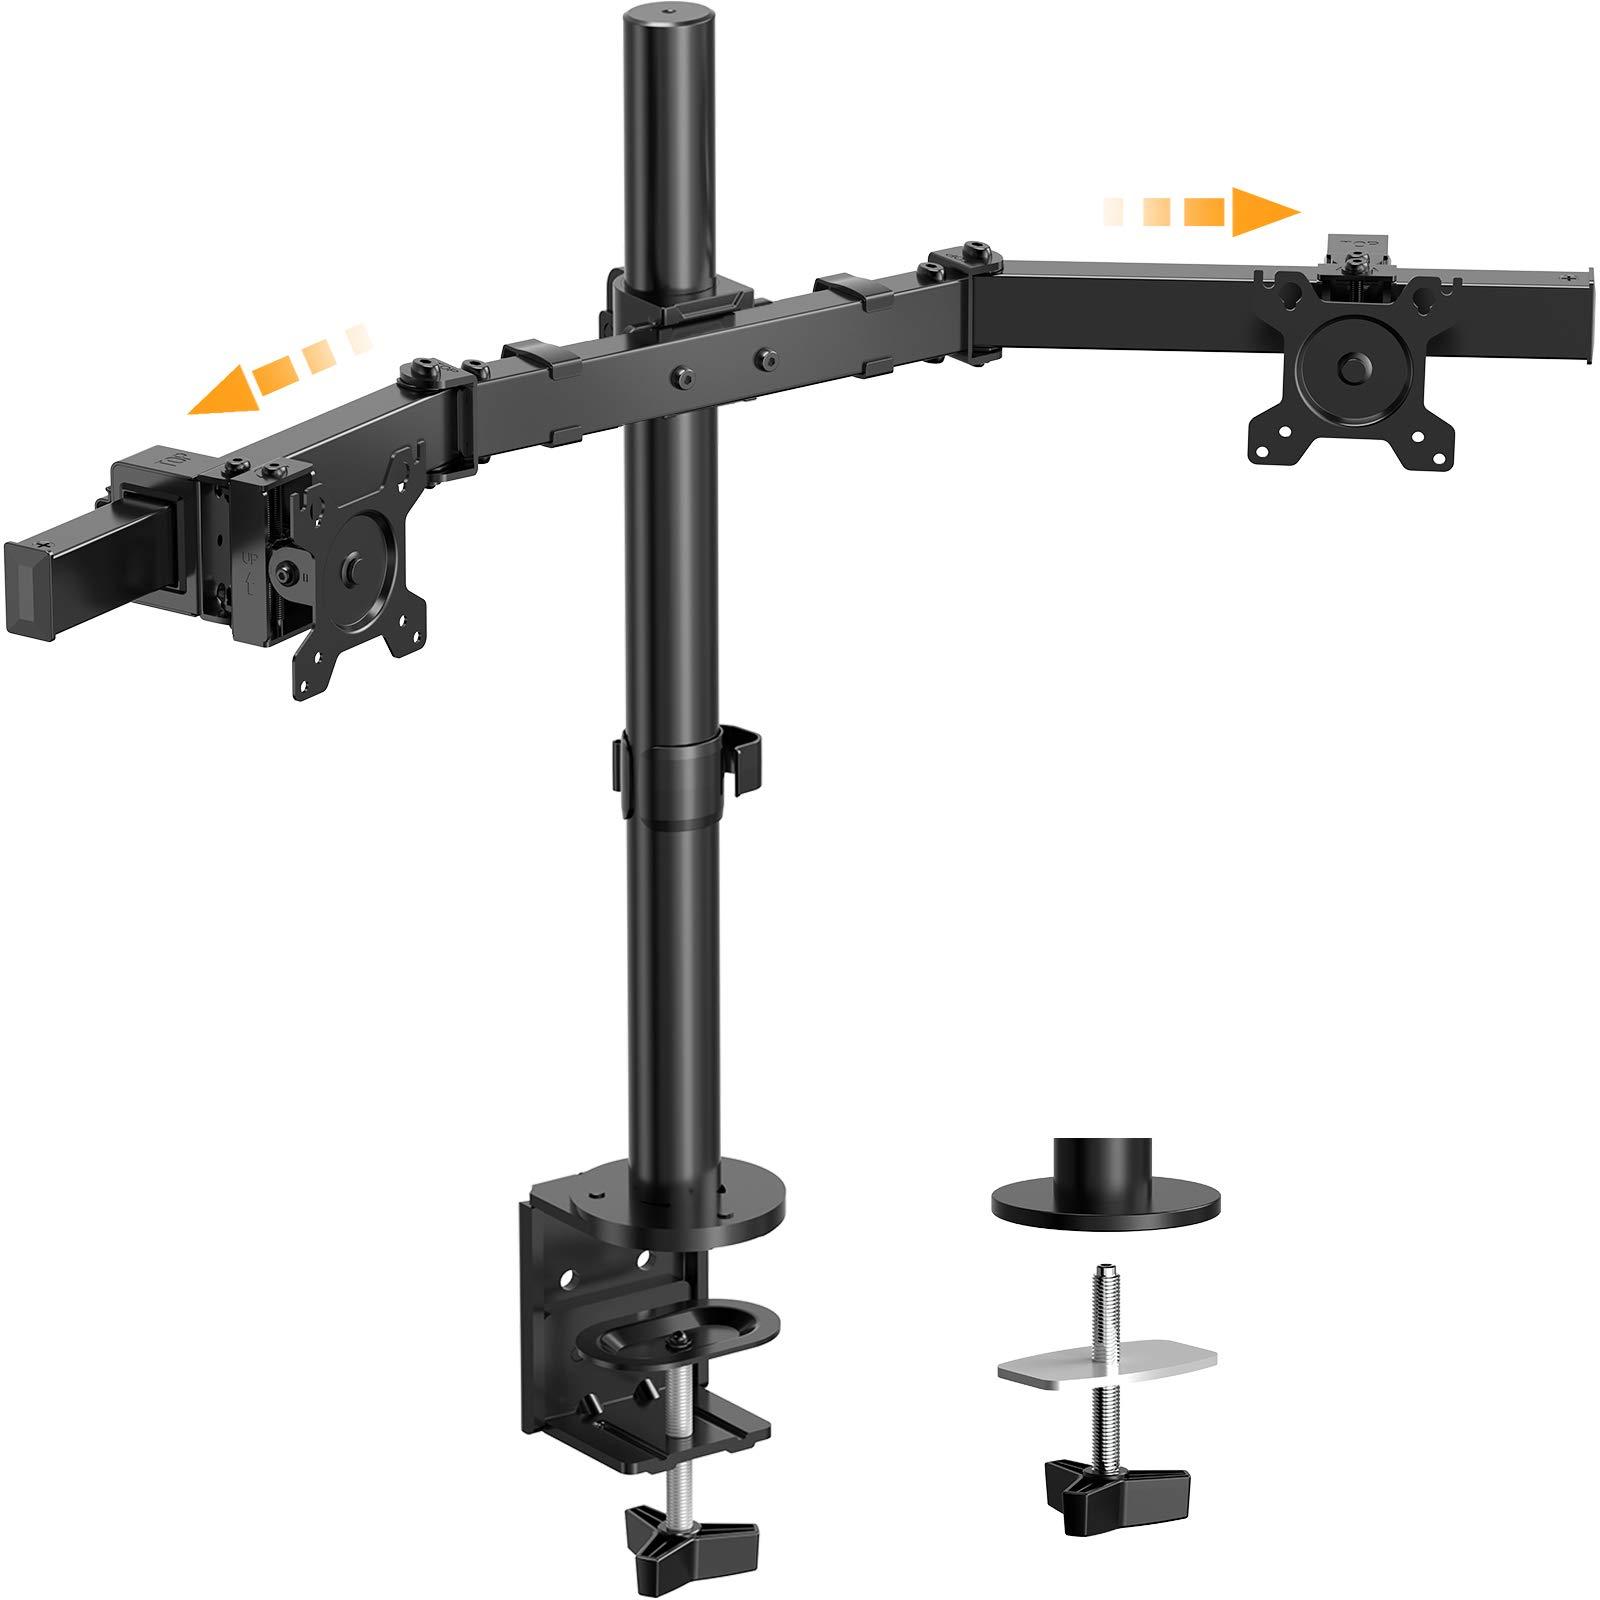 "ErGear Dual Monitor Desk Mount Stand 17-32"", Adjustable Sliding Monitor Arms 26.4lbs, Dual Monitor Stand with C-Clamp and Grommet Base, 75/100mm VESA, Black - EGCM5"